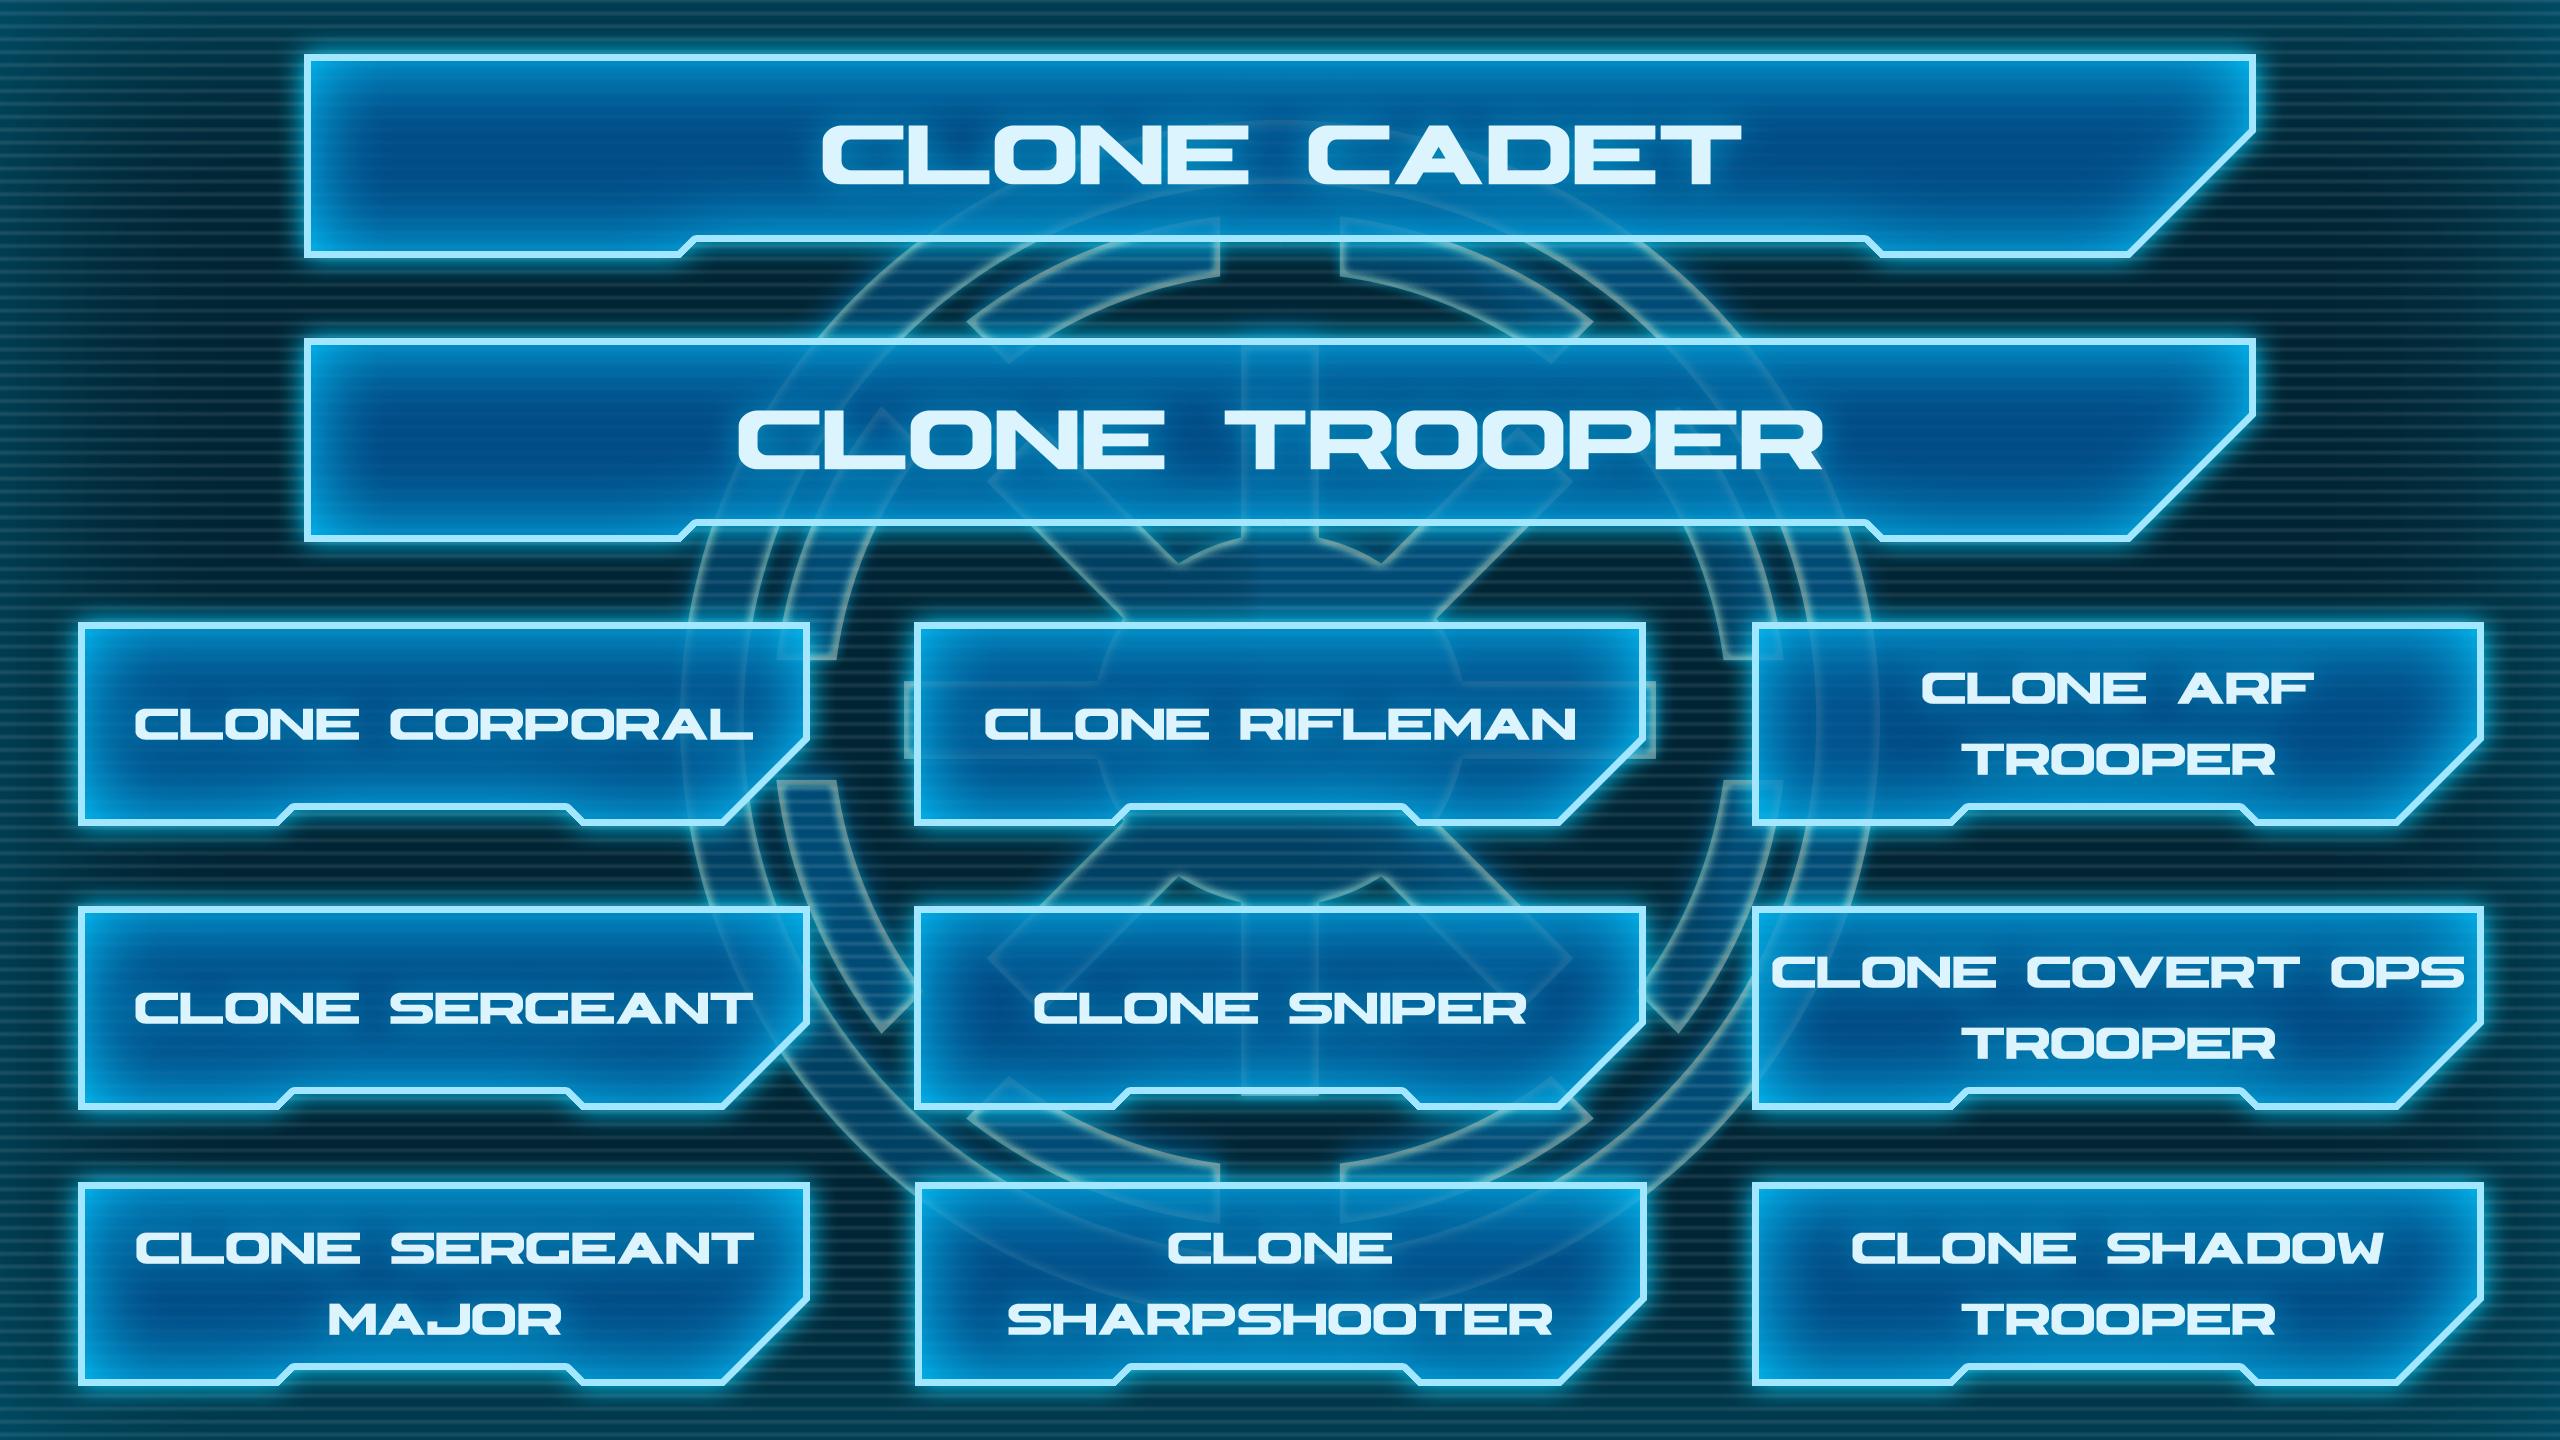 Clone Cadet Tree 1